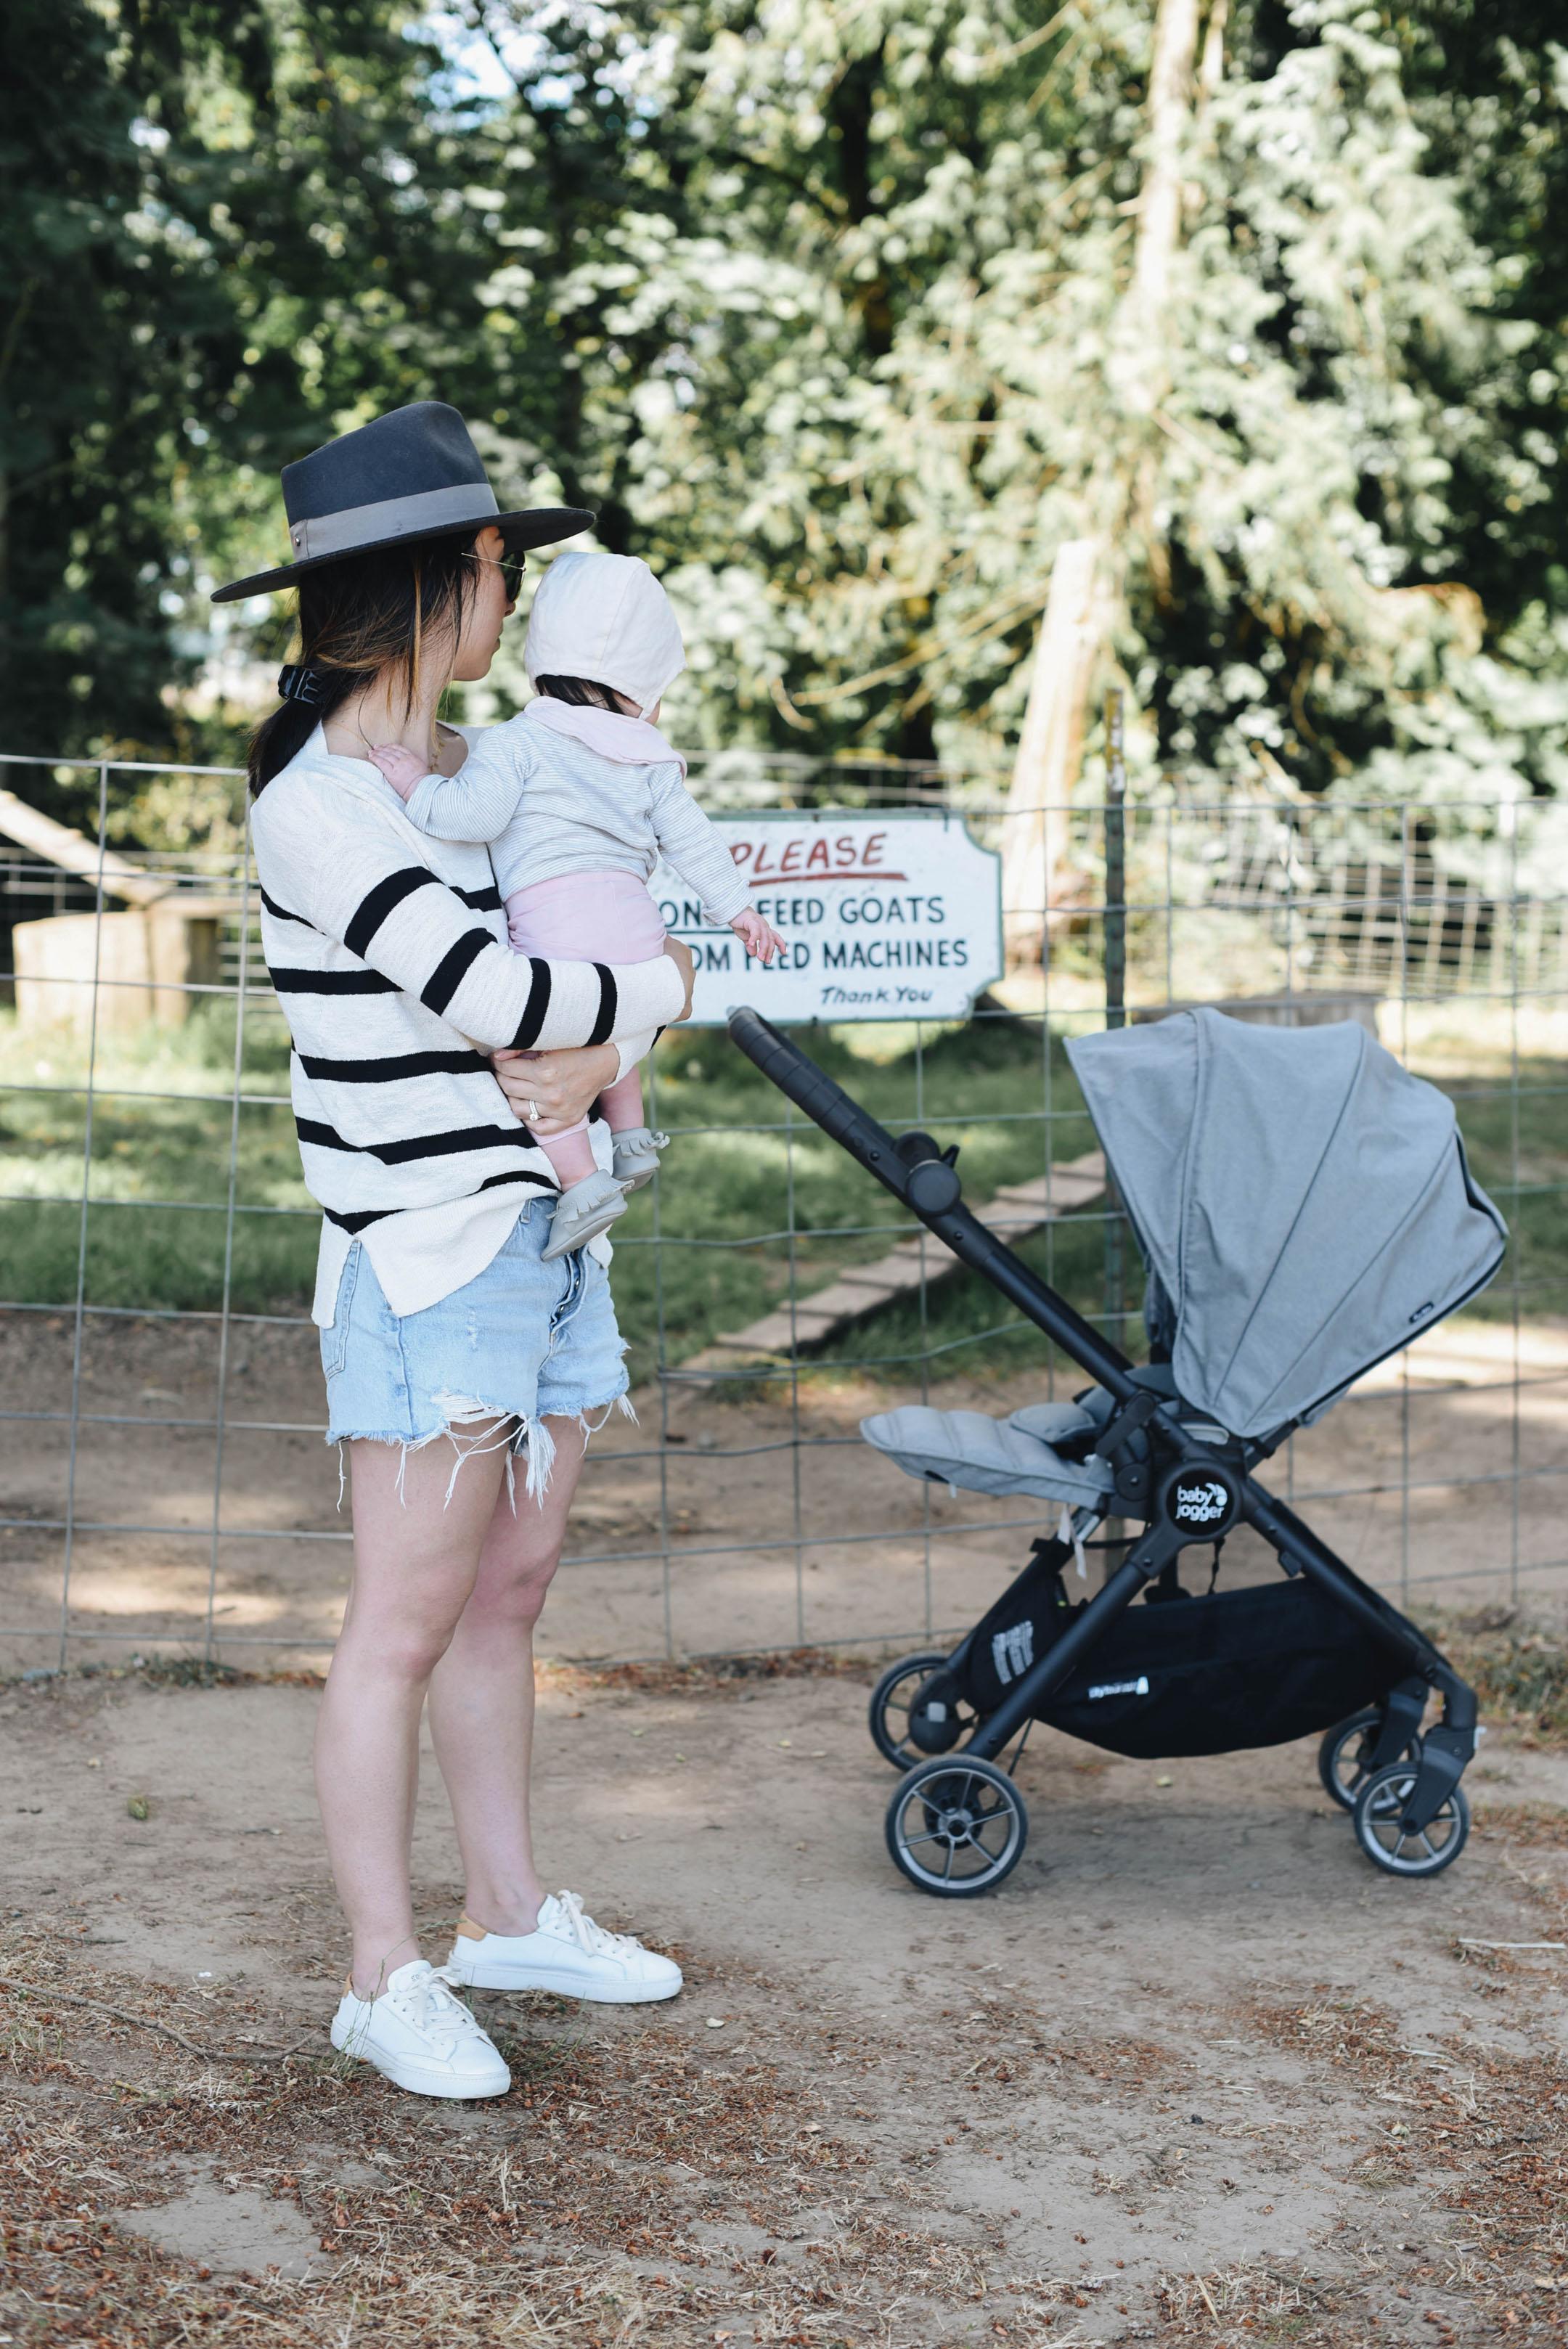 Crystalin Marie and Baby Jogger